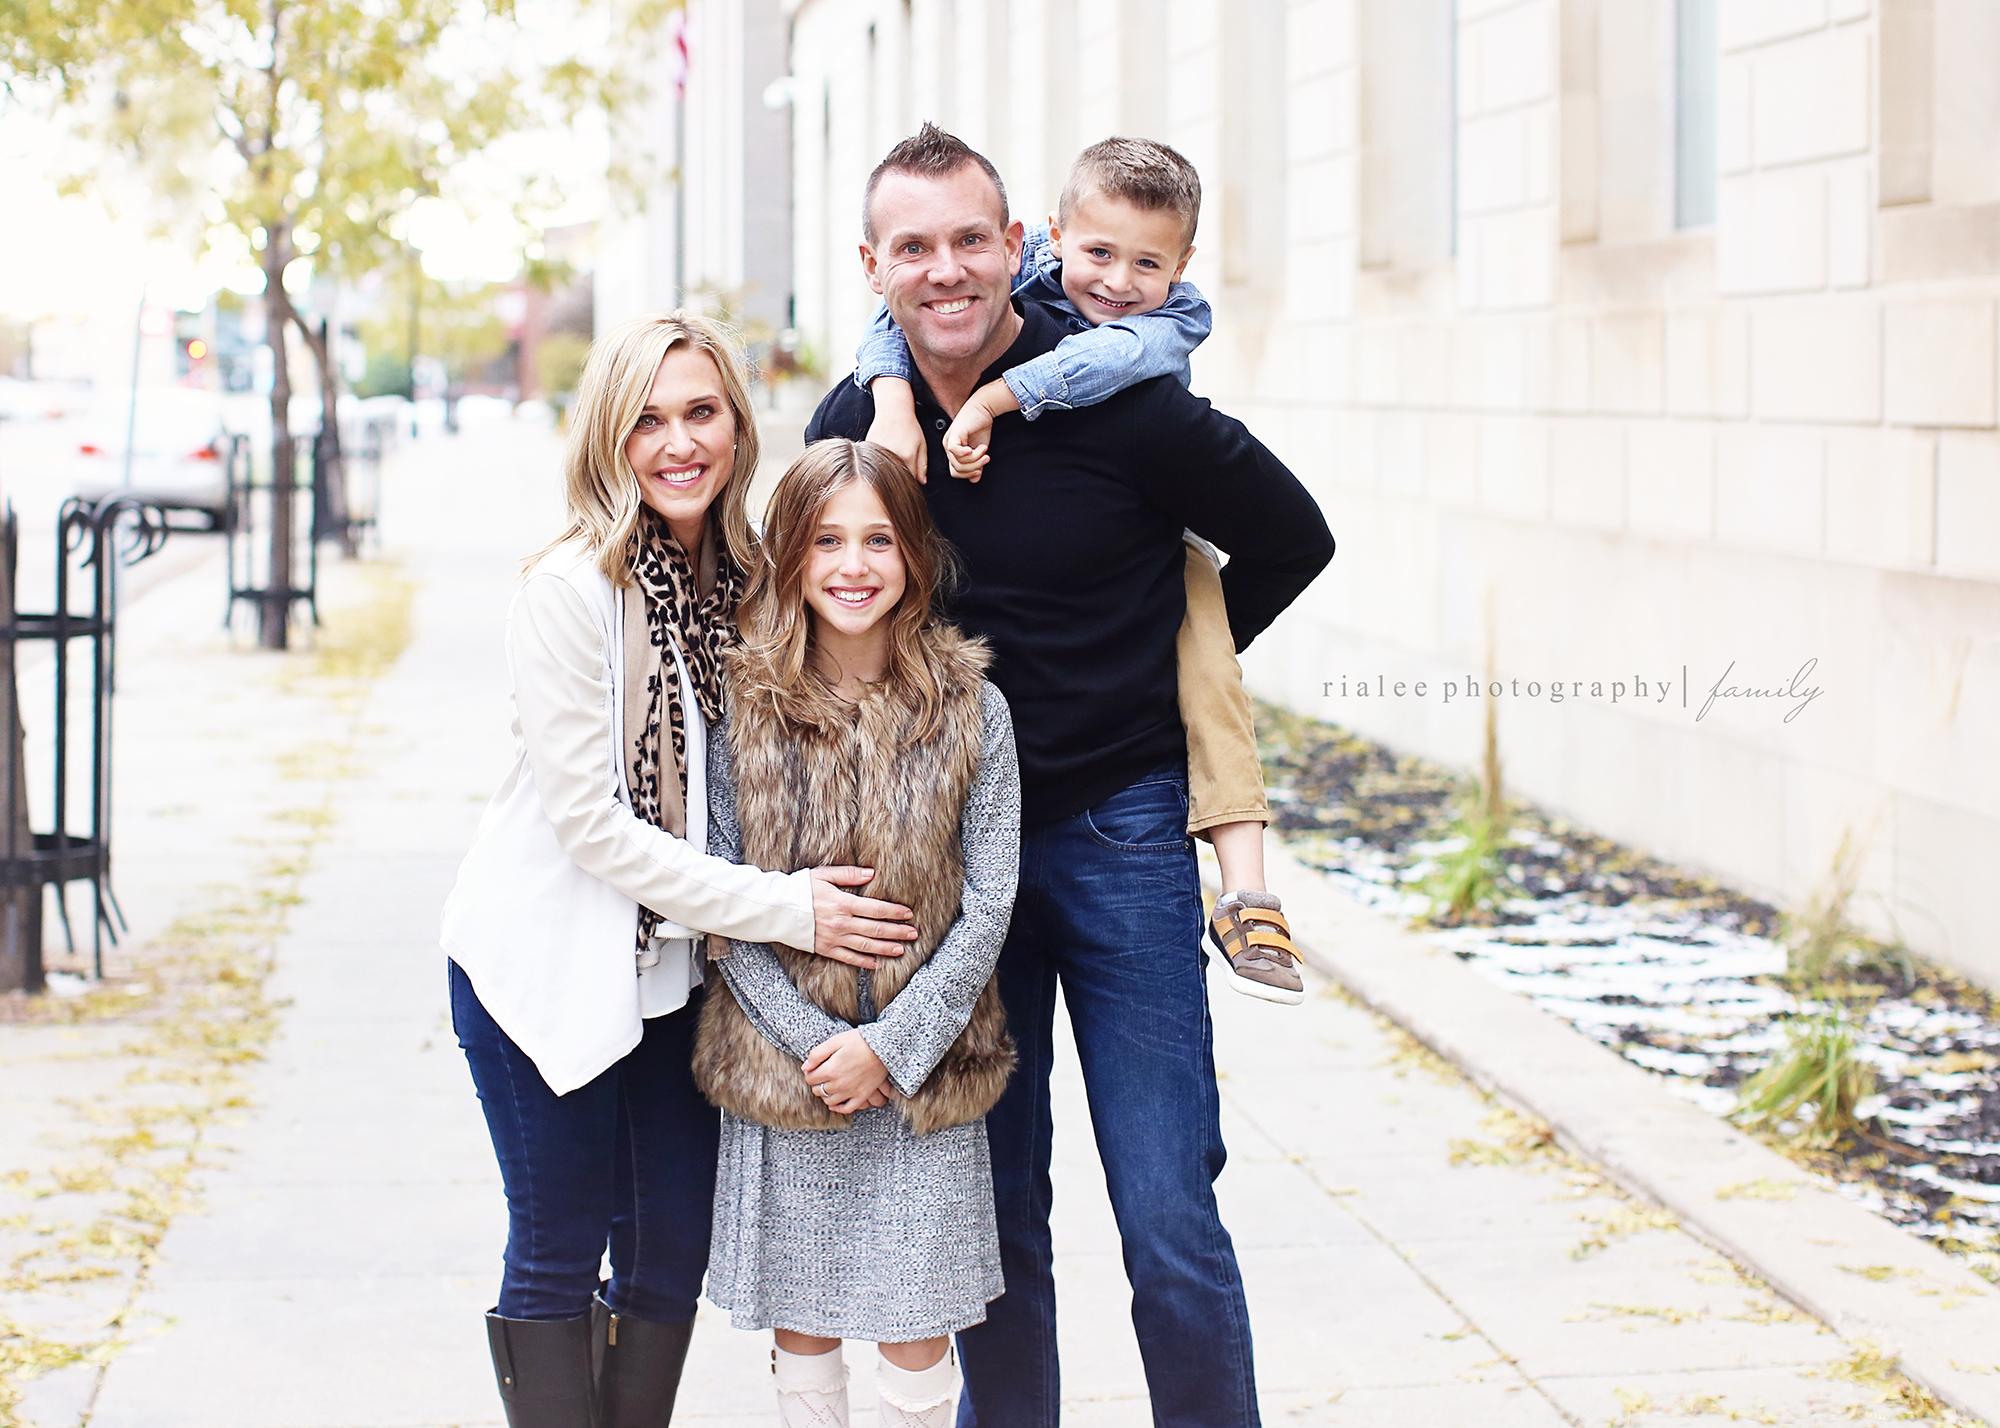 bestfamilyphotographersinfargo.jpg